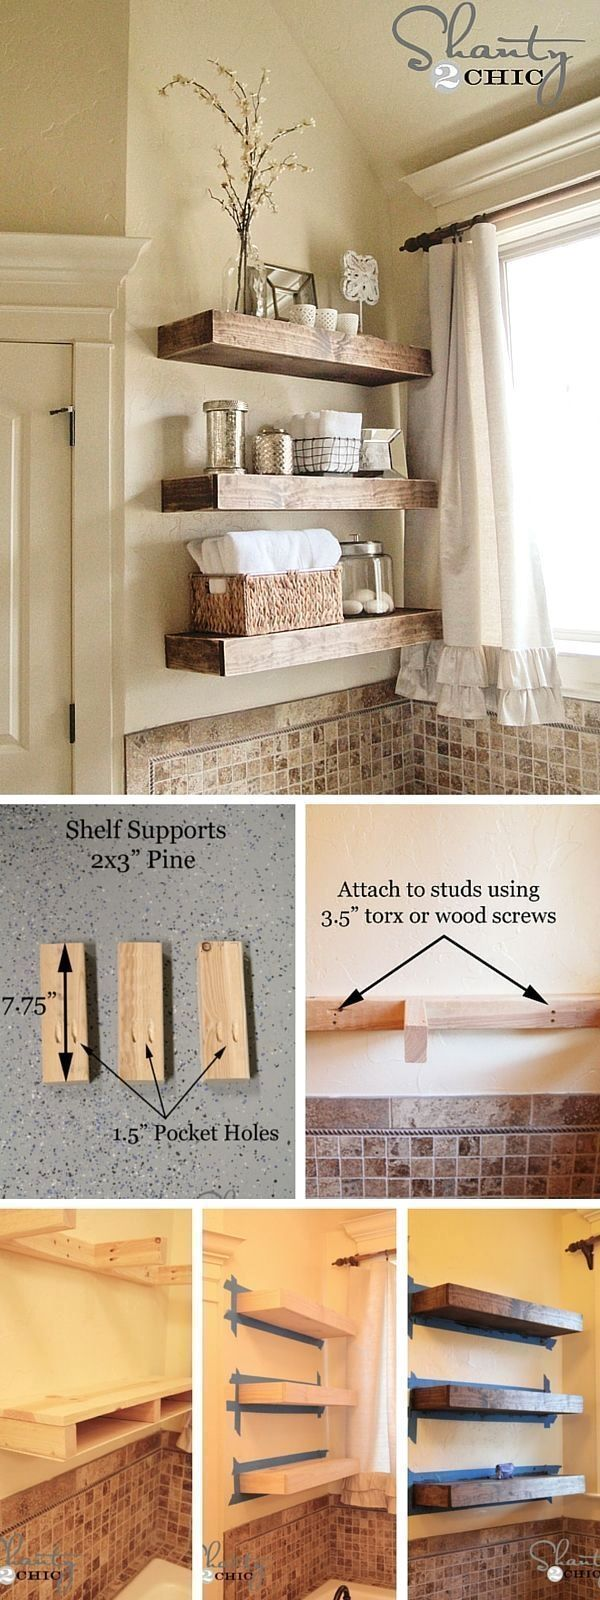 Home Design Ideas: Home Decorating Ideas Bathroom Home Decorating Ideas Bathroom Check out the tutorial: DIY Rustic Bathroom Shelves #decoratingbathrooms #bathroomideas #diyhomedecor